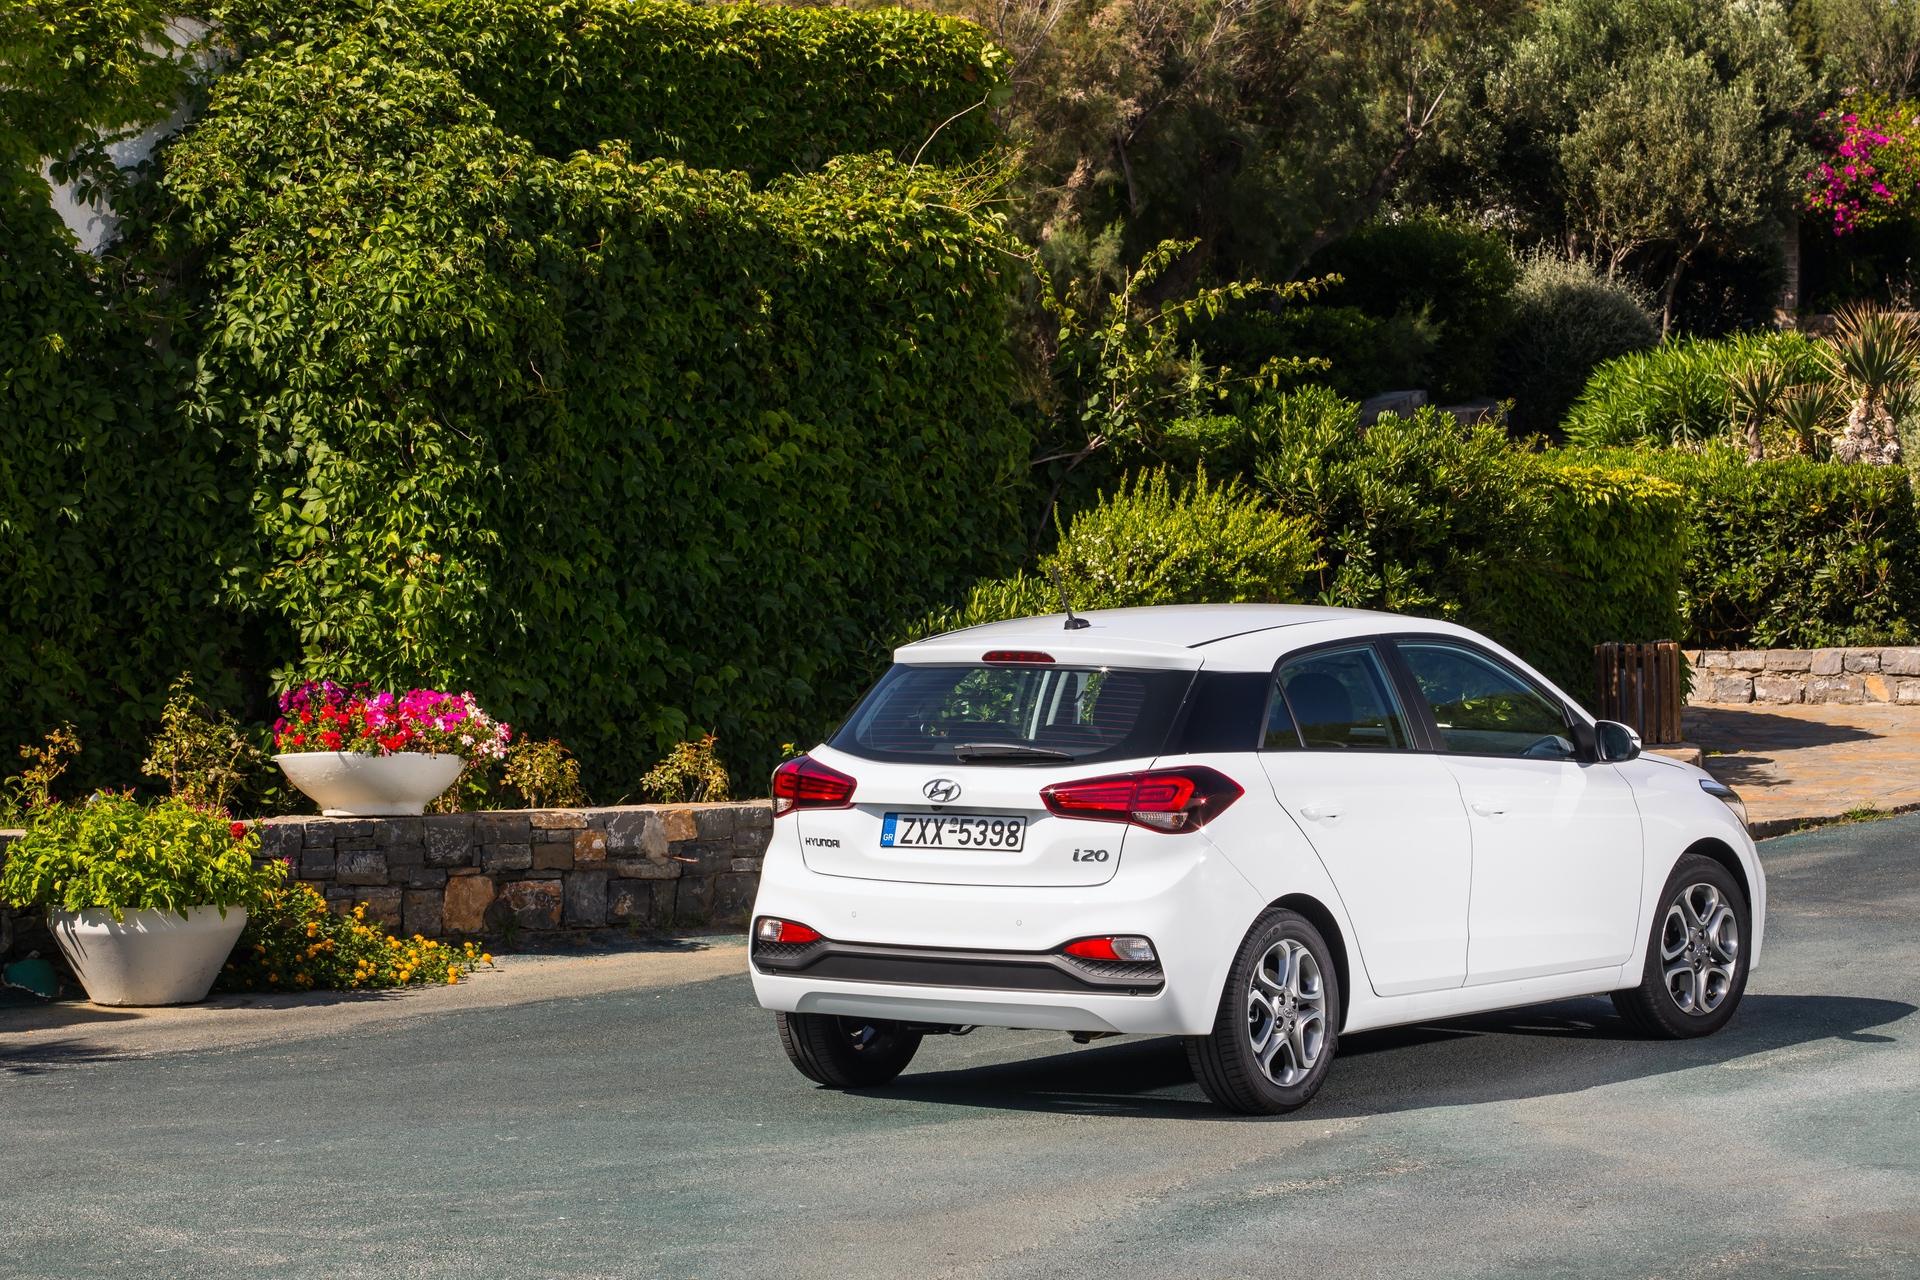 Hyundai_i20_facelift_greek_presskit_0007